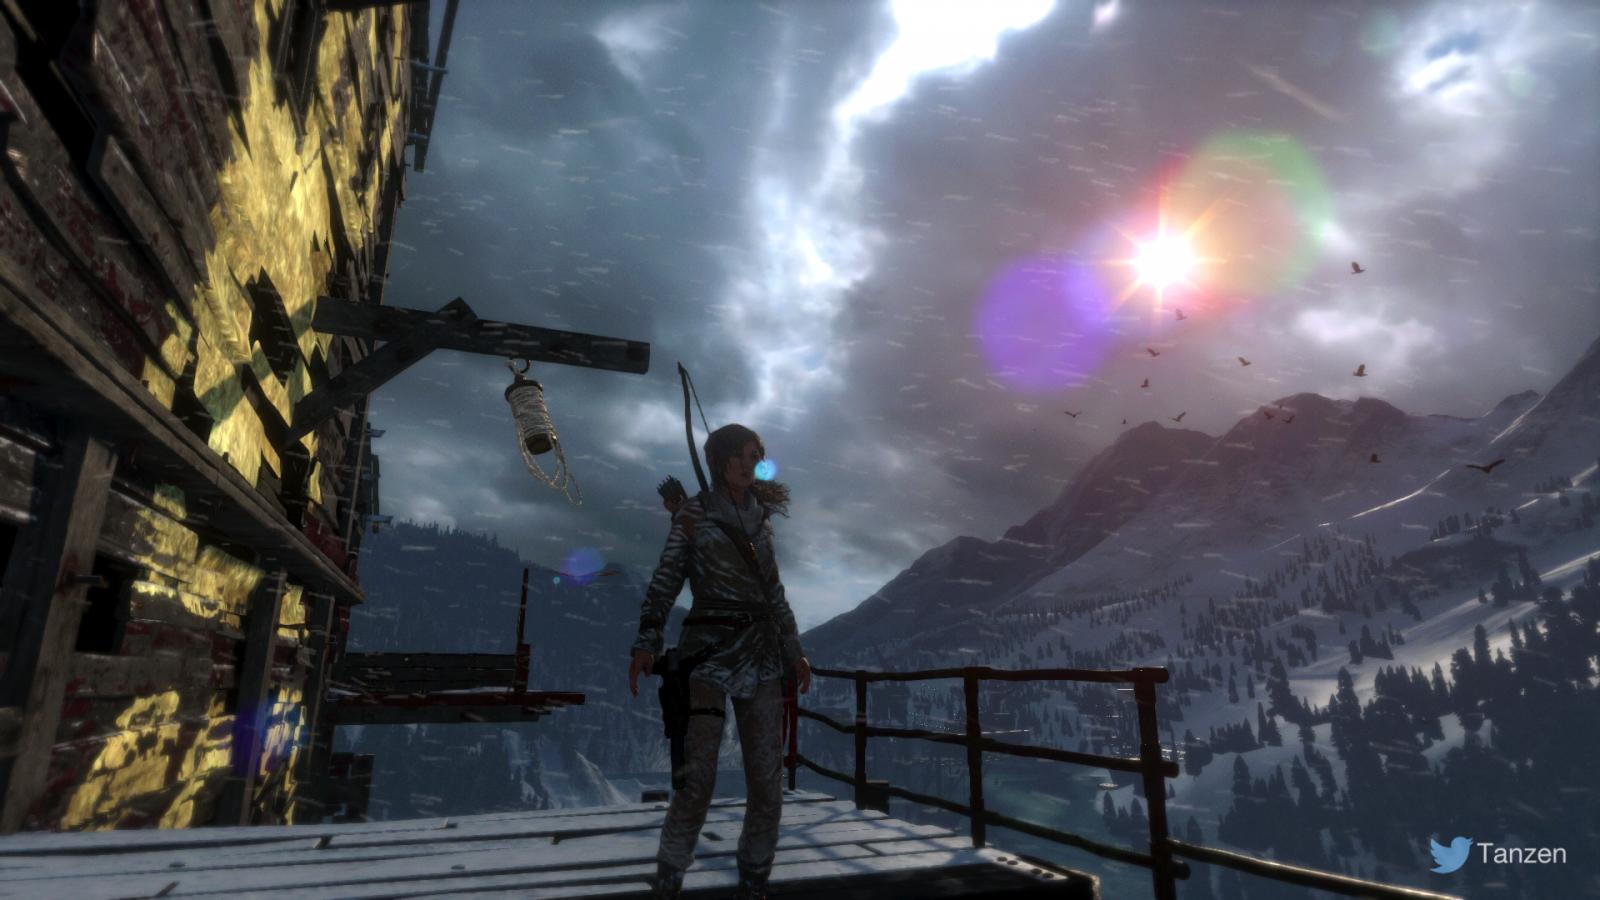 Rise of the Tomb Raider Screen Shot 09.11.15 20.07_watermark